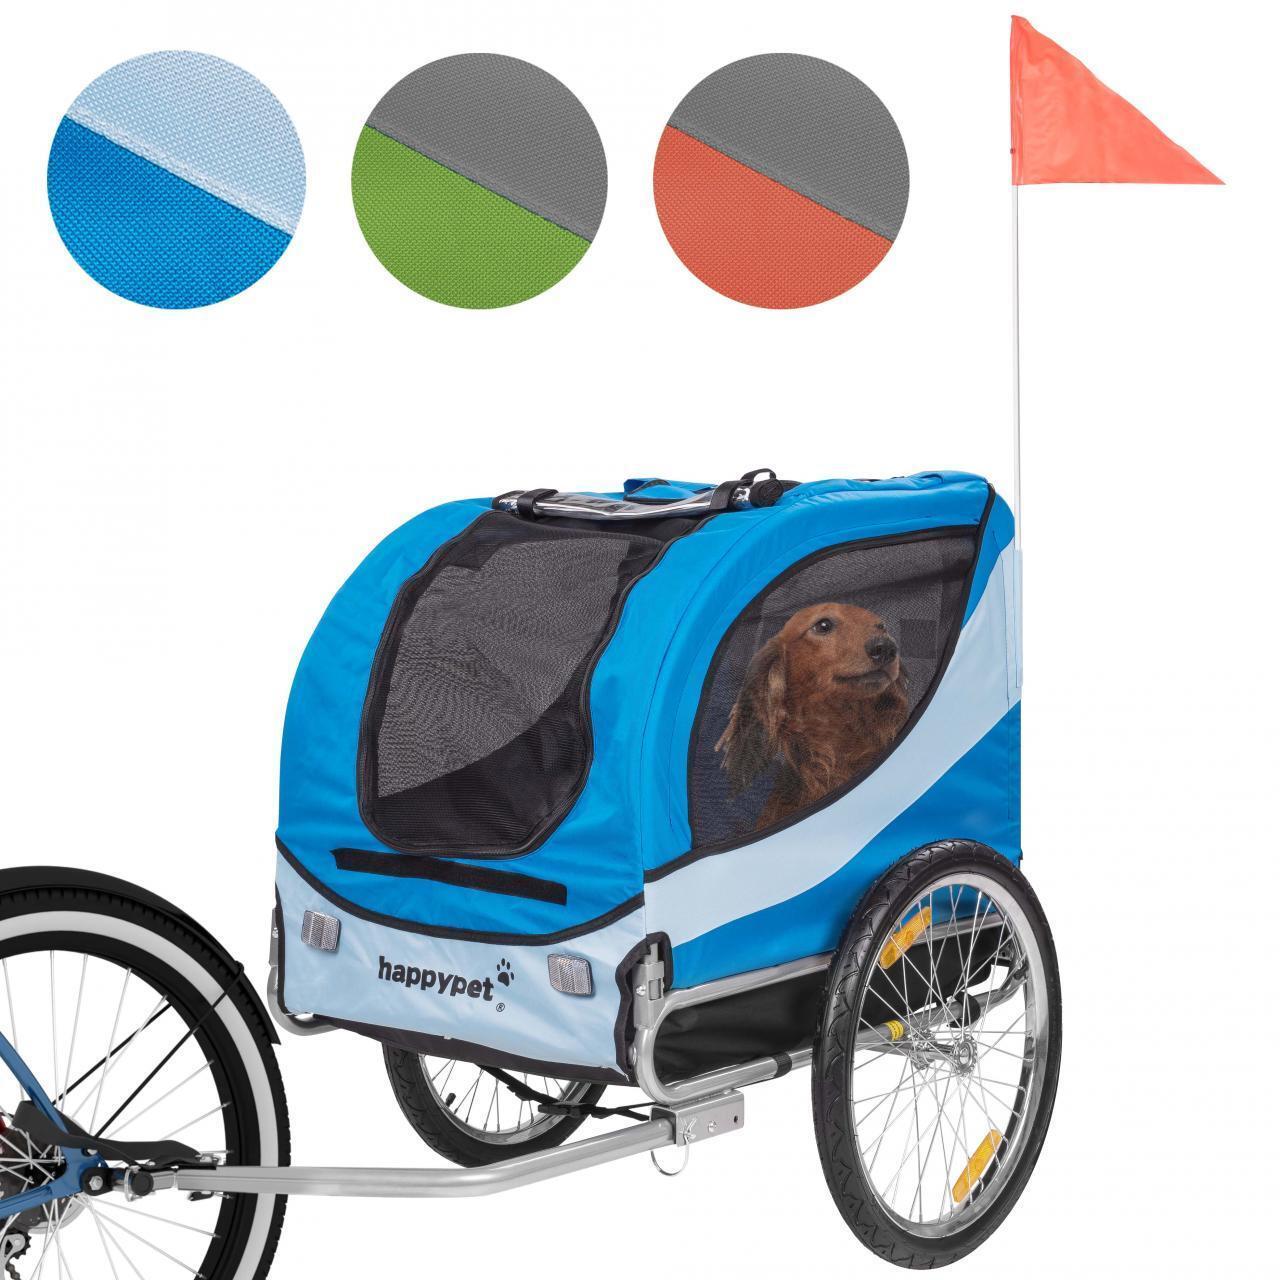 Happypet ® rimor o per cani cani TRANSPORTER Rimor o per bicicletta per cani rimor o bicicletta